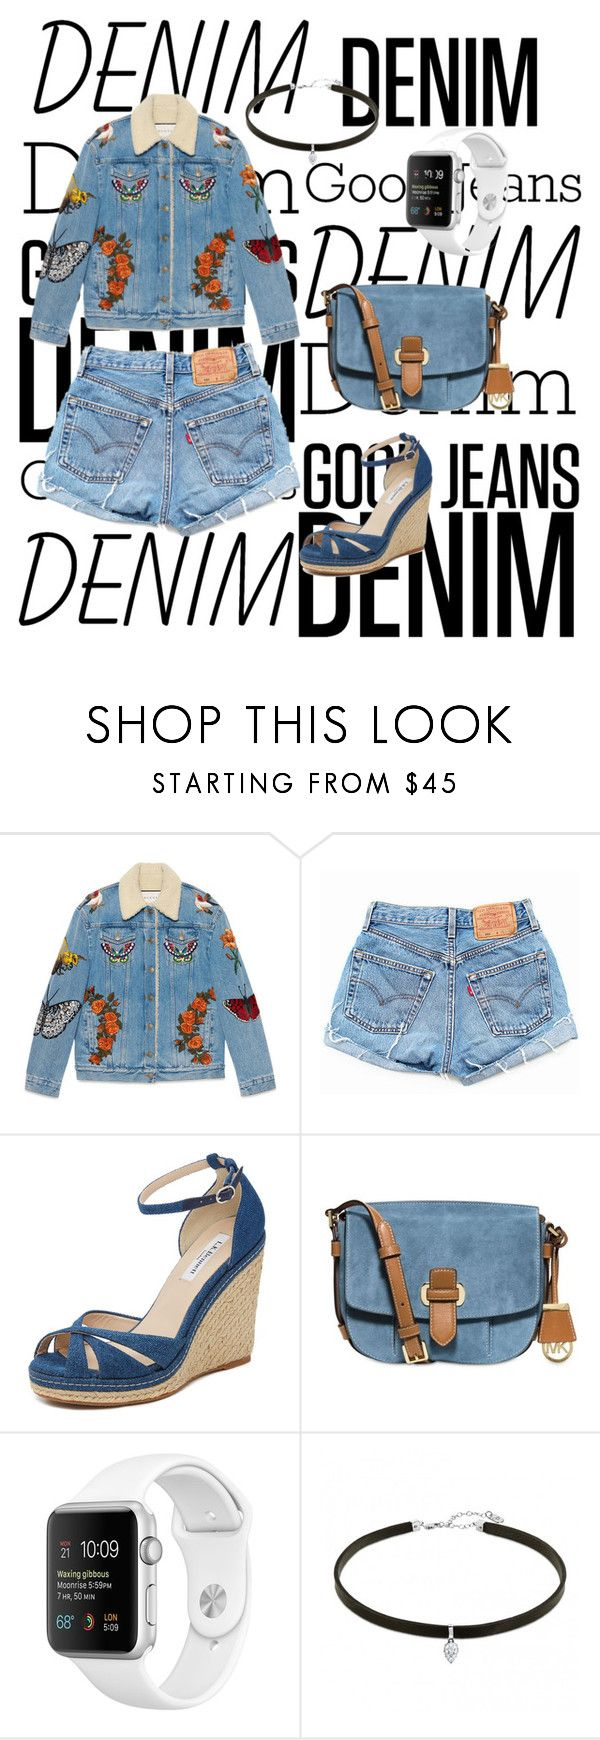 """Denim on Denim"" by fantalia2604 ❤ liked on Polyvore featuring Gucci, Levi's, L.K.Bennett, MICHAEL Michael Kors and Denimondenim"